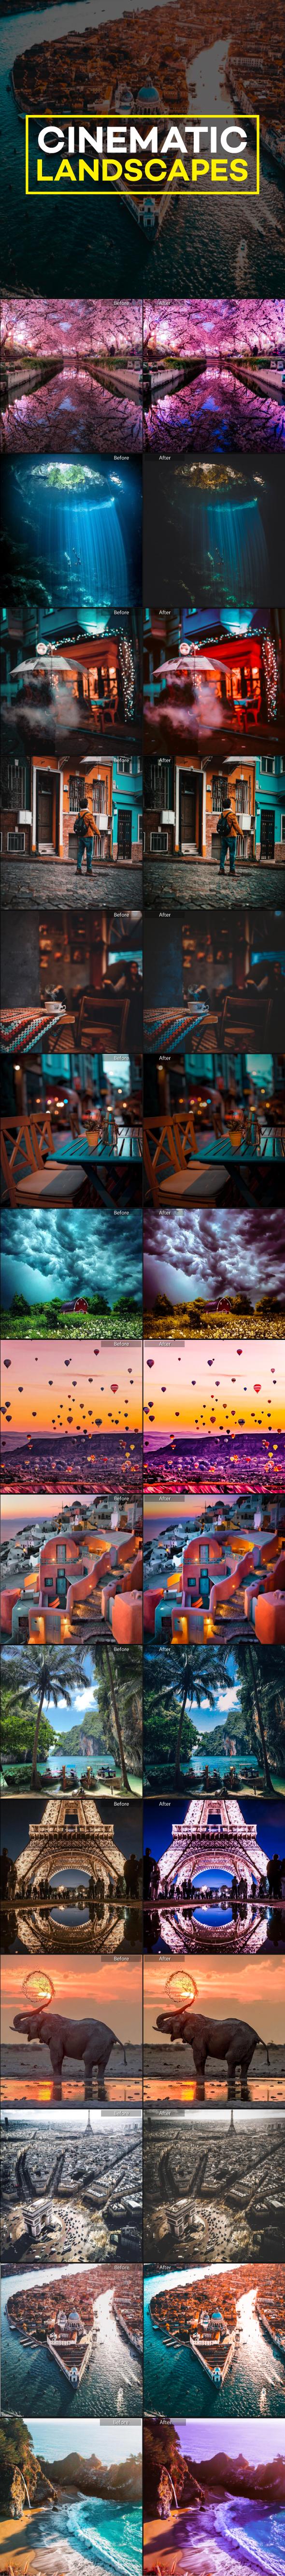 21 Pro Moody Cinematic Landscape Lightroom Presets - Landscape Lightroom Presets